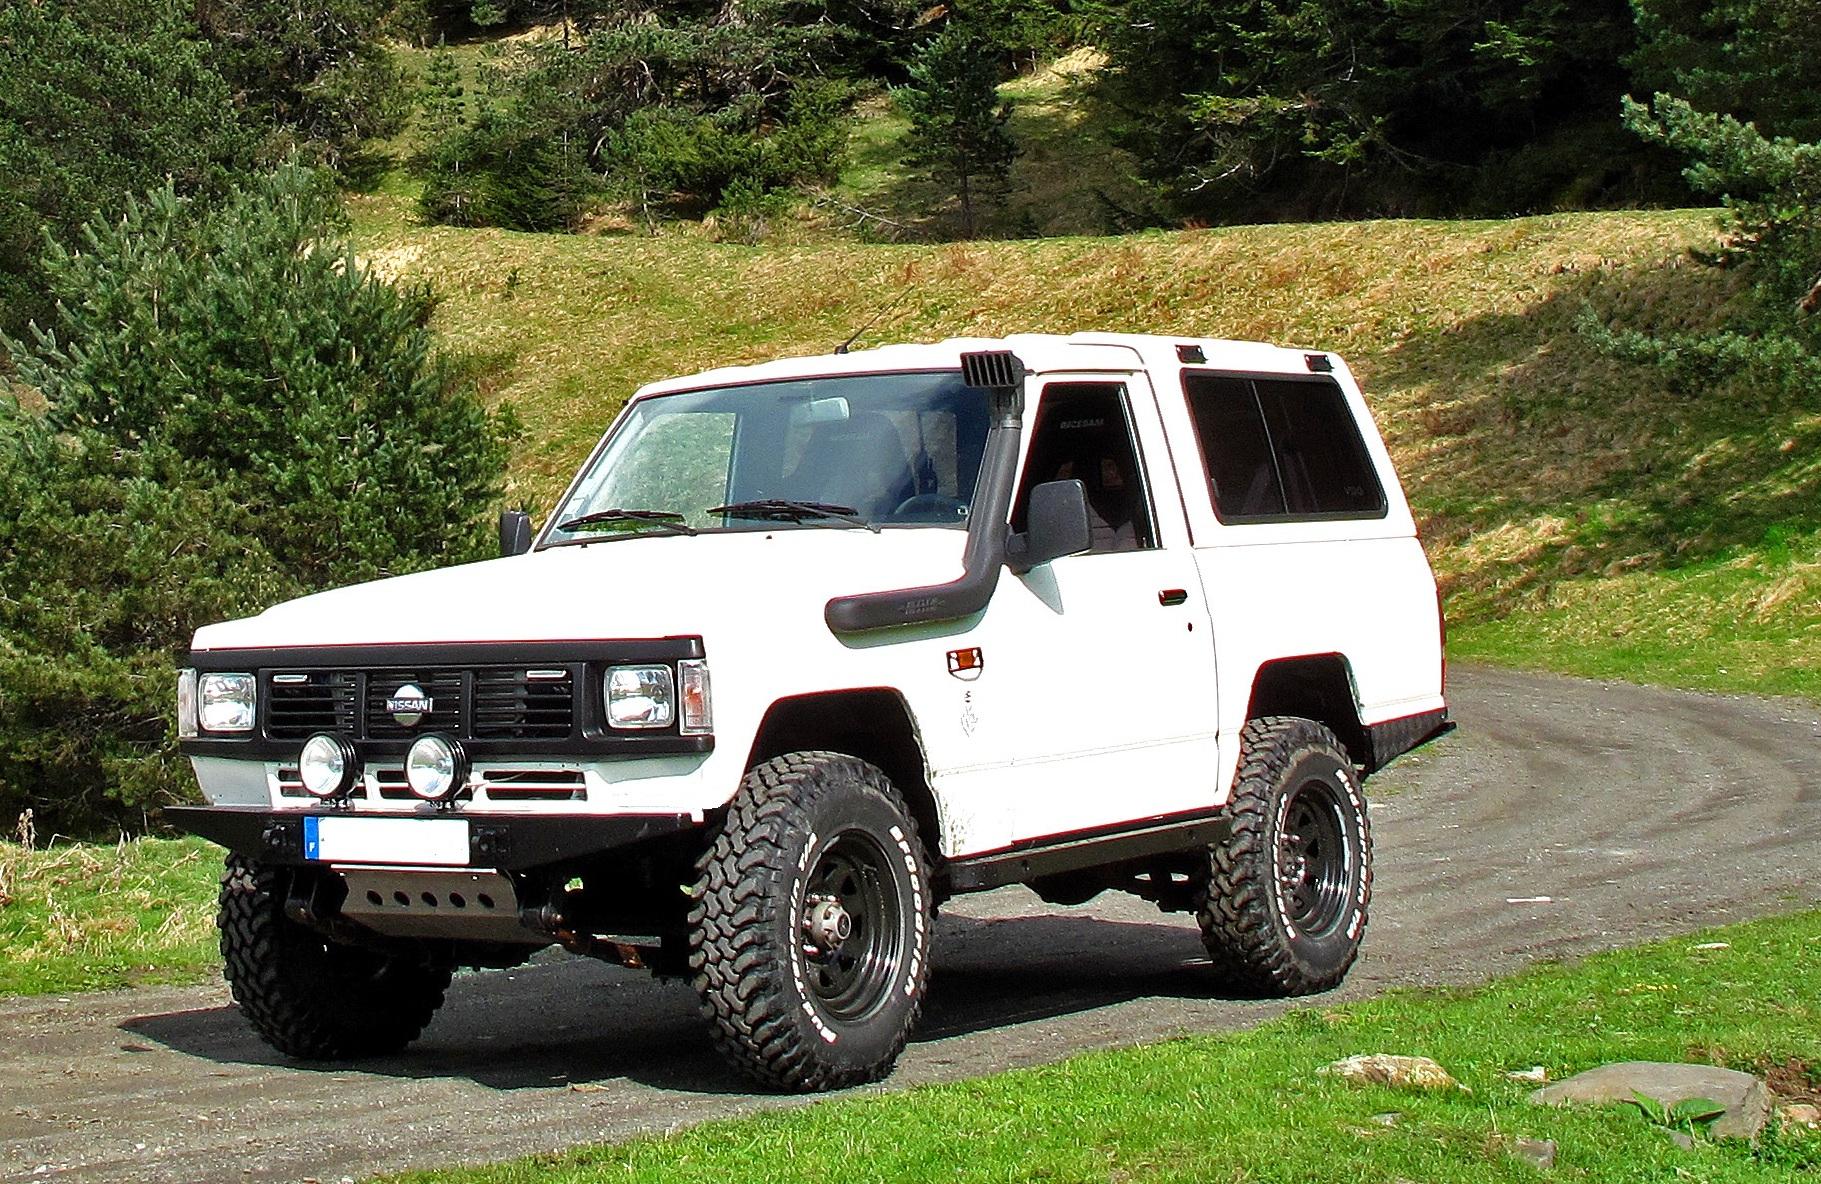 nissan safari patrol 160 convertible suv